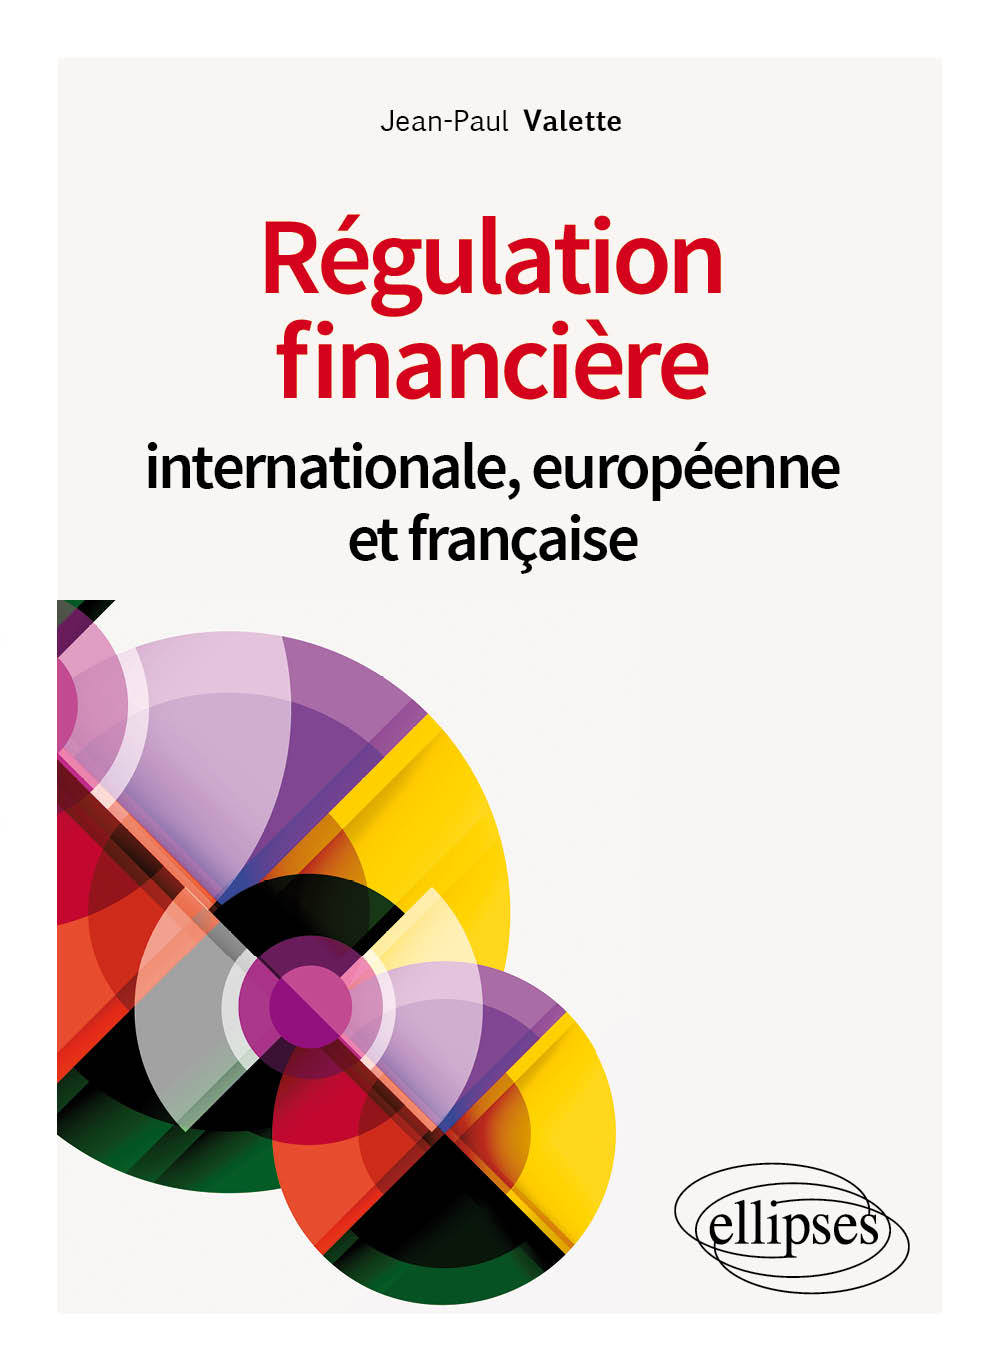 REGULATION FINANCIERE INTERNATIONALE, EUROPEENNE ET FRANCAISE